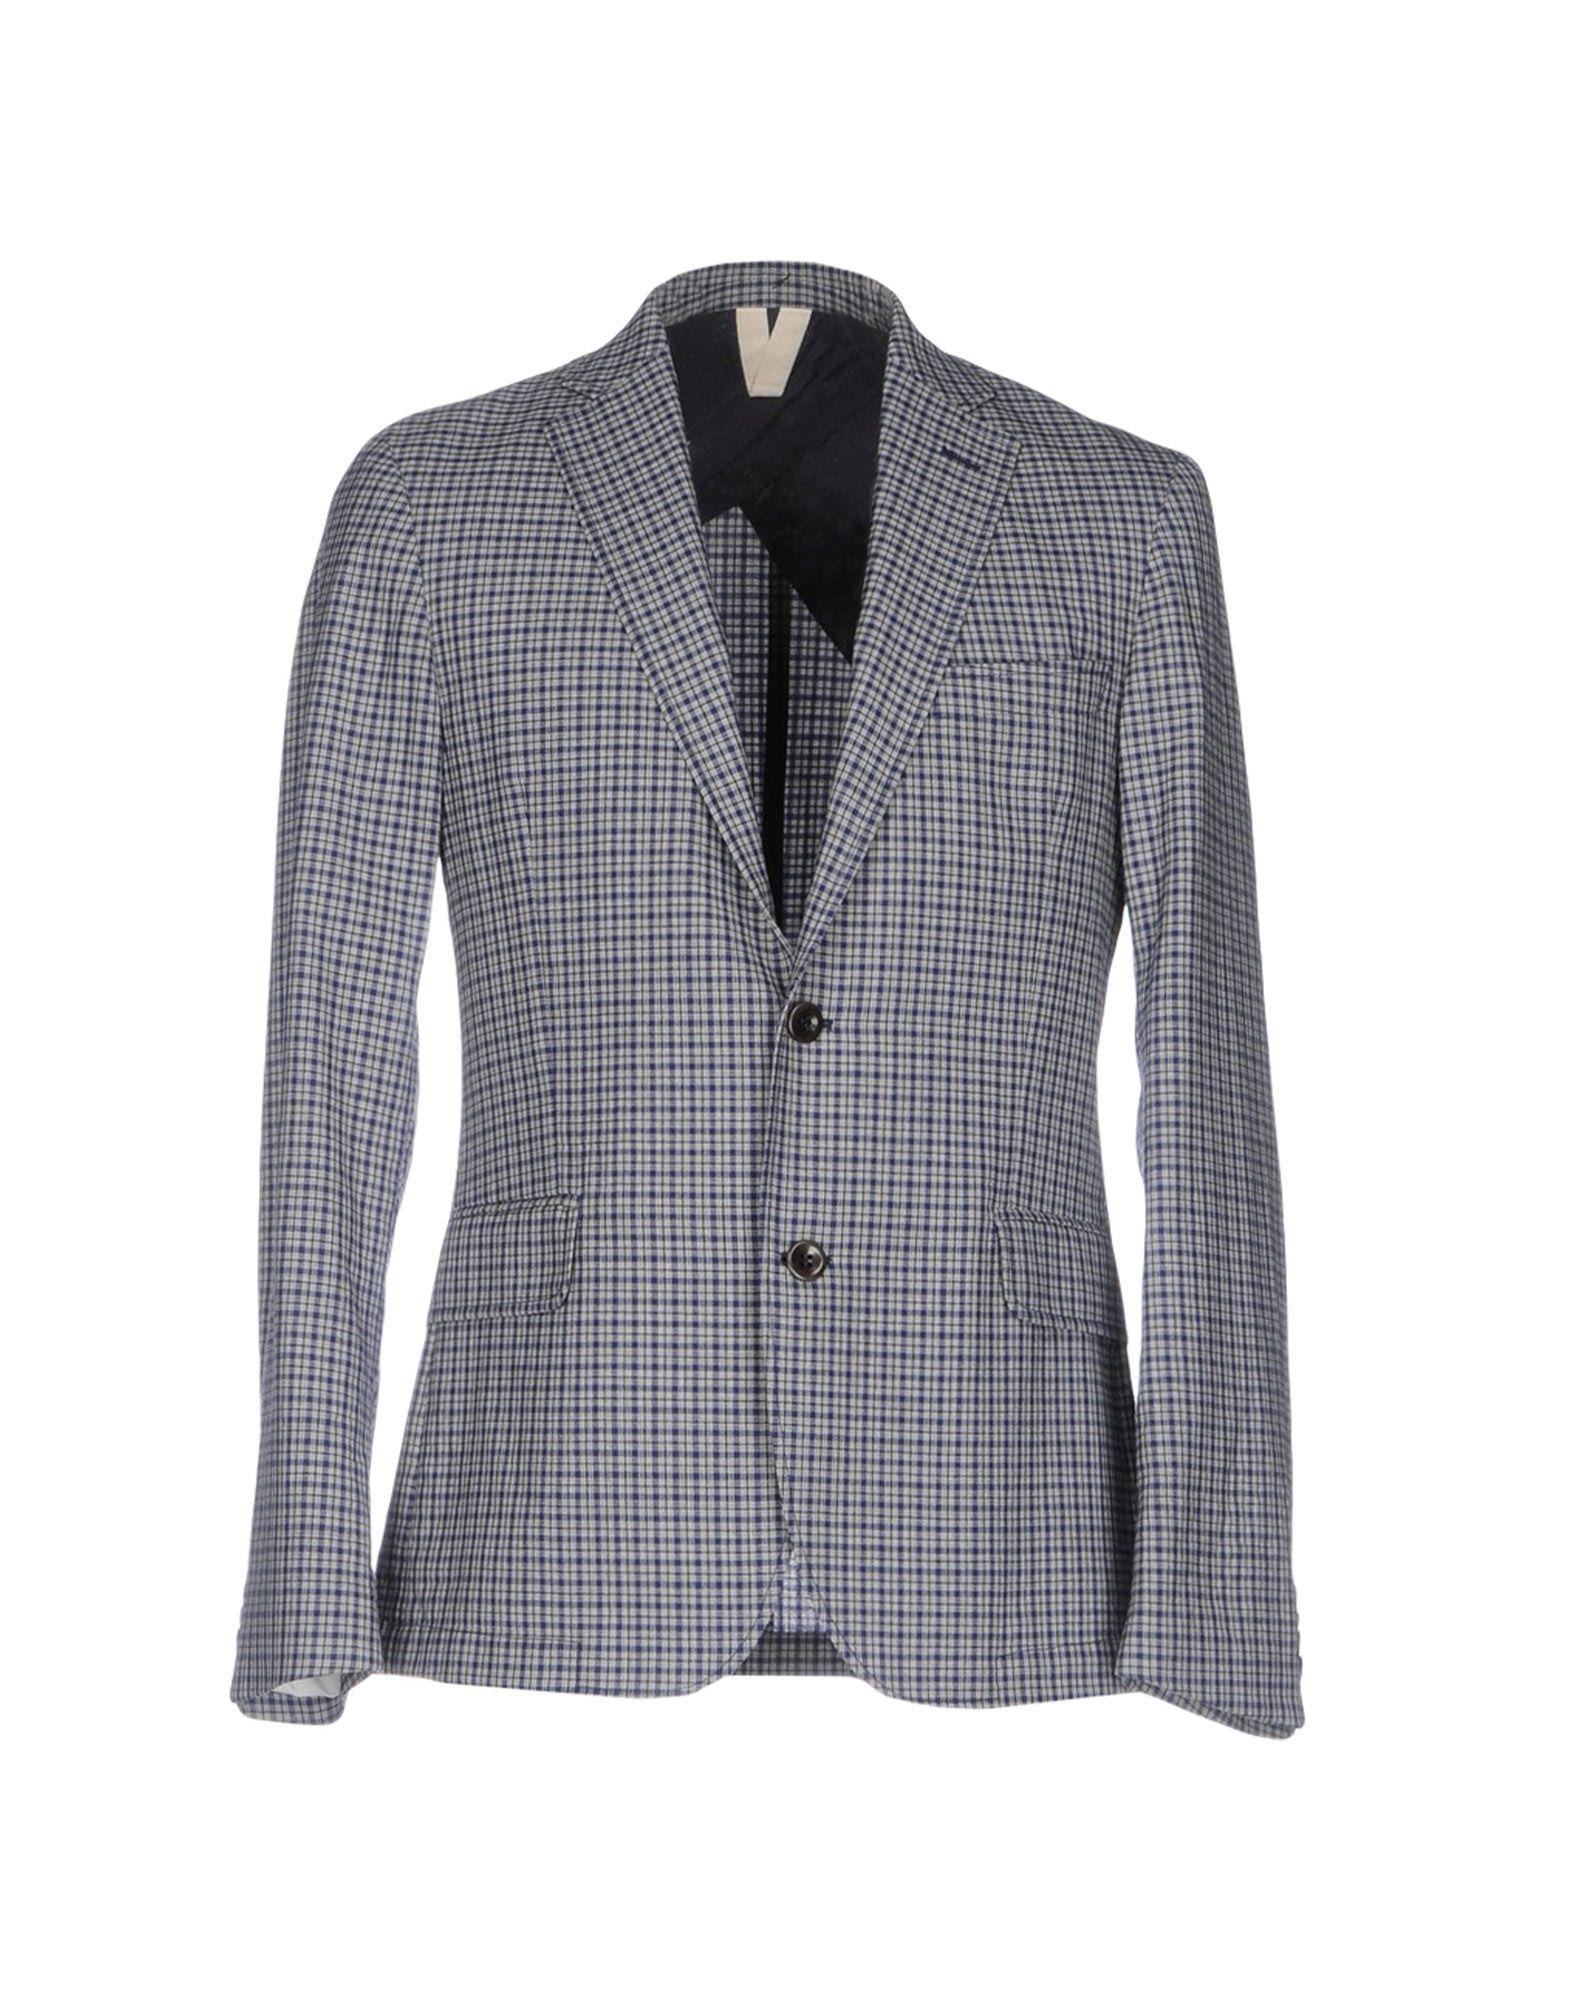 OSCAR JACOBSON Blazer in Grey